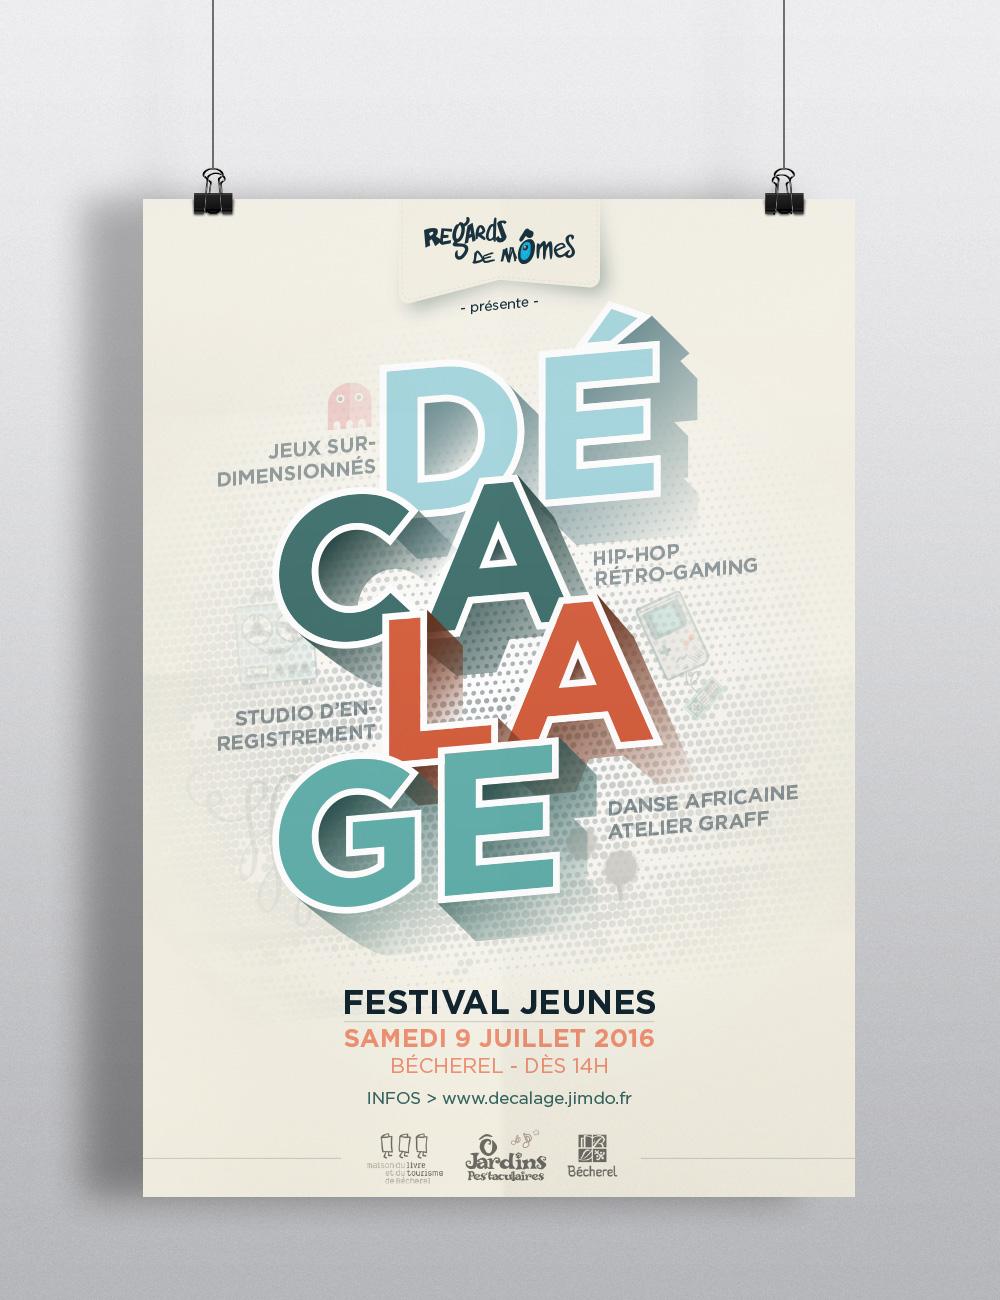 Affiche festival Ados - Décalage - 2016 #1